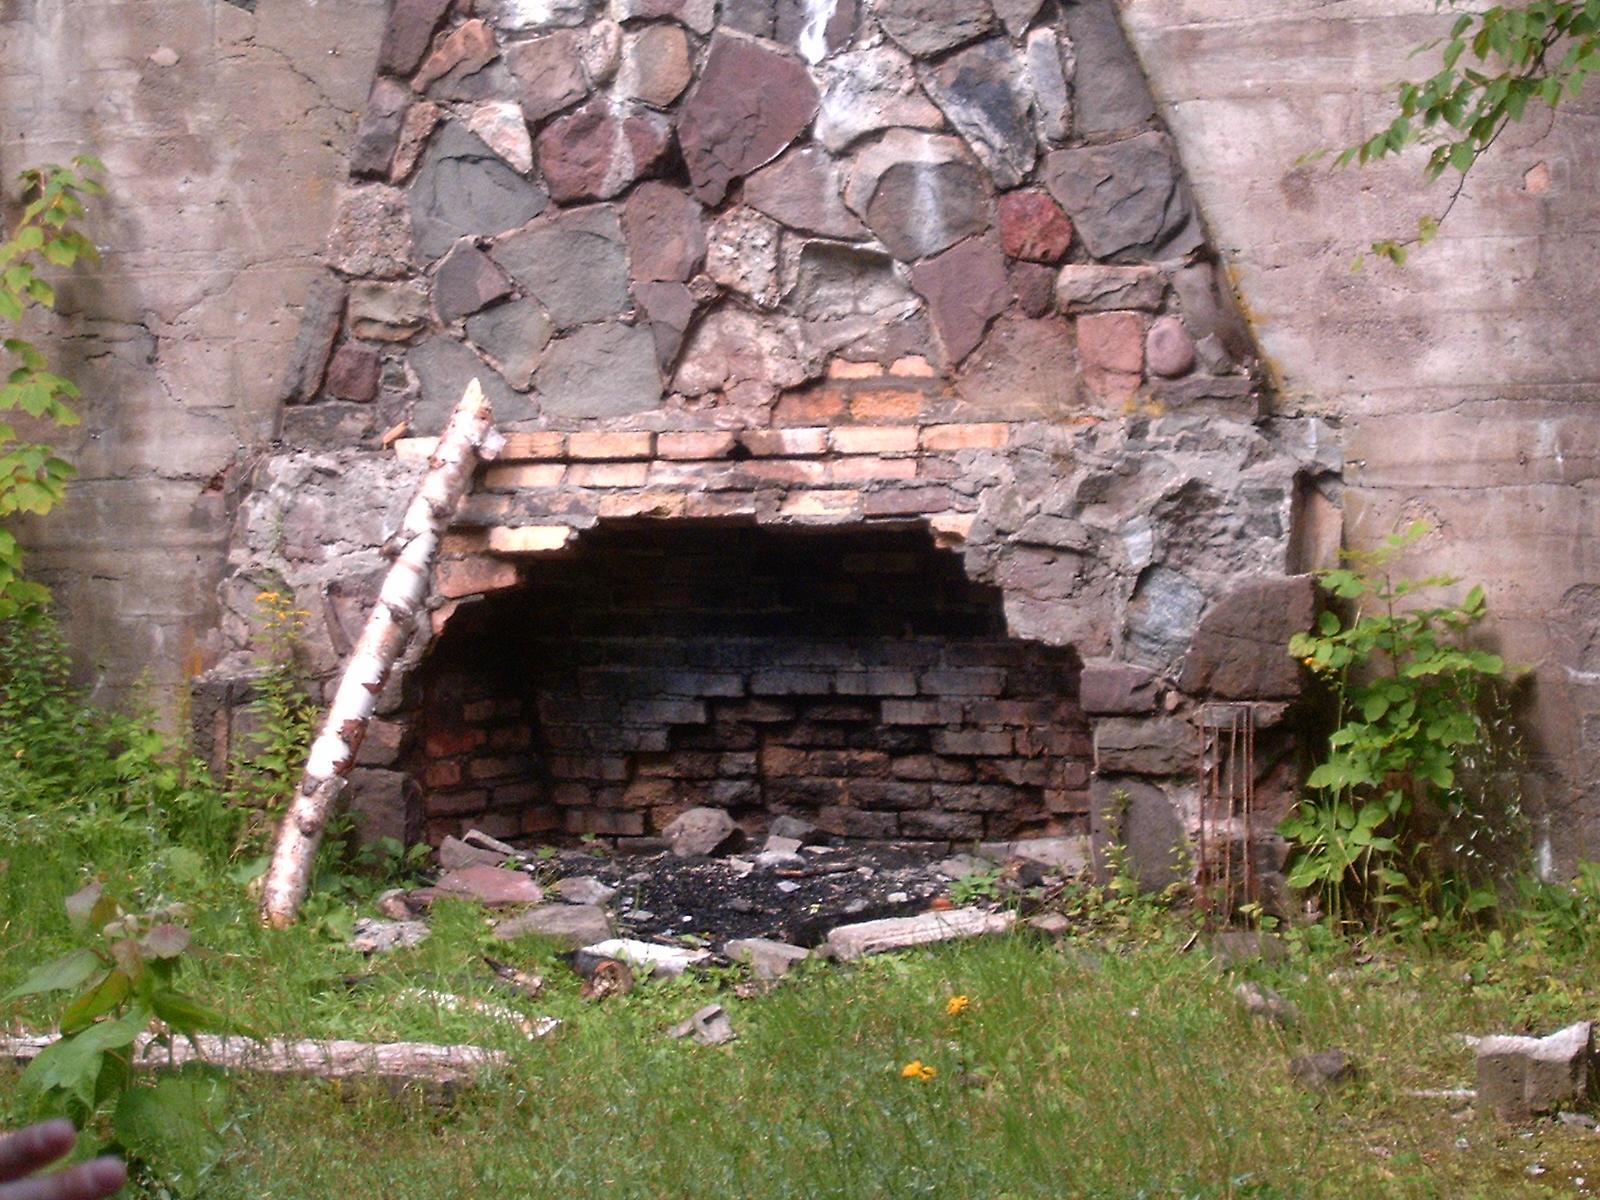 File:Overlook Mountain House Fireplace.JPG - Wikimedia Commons